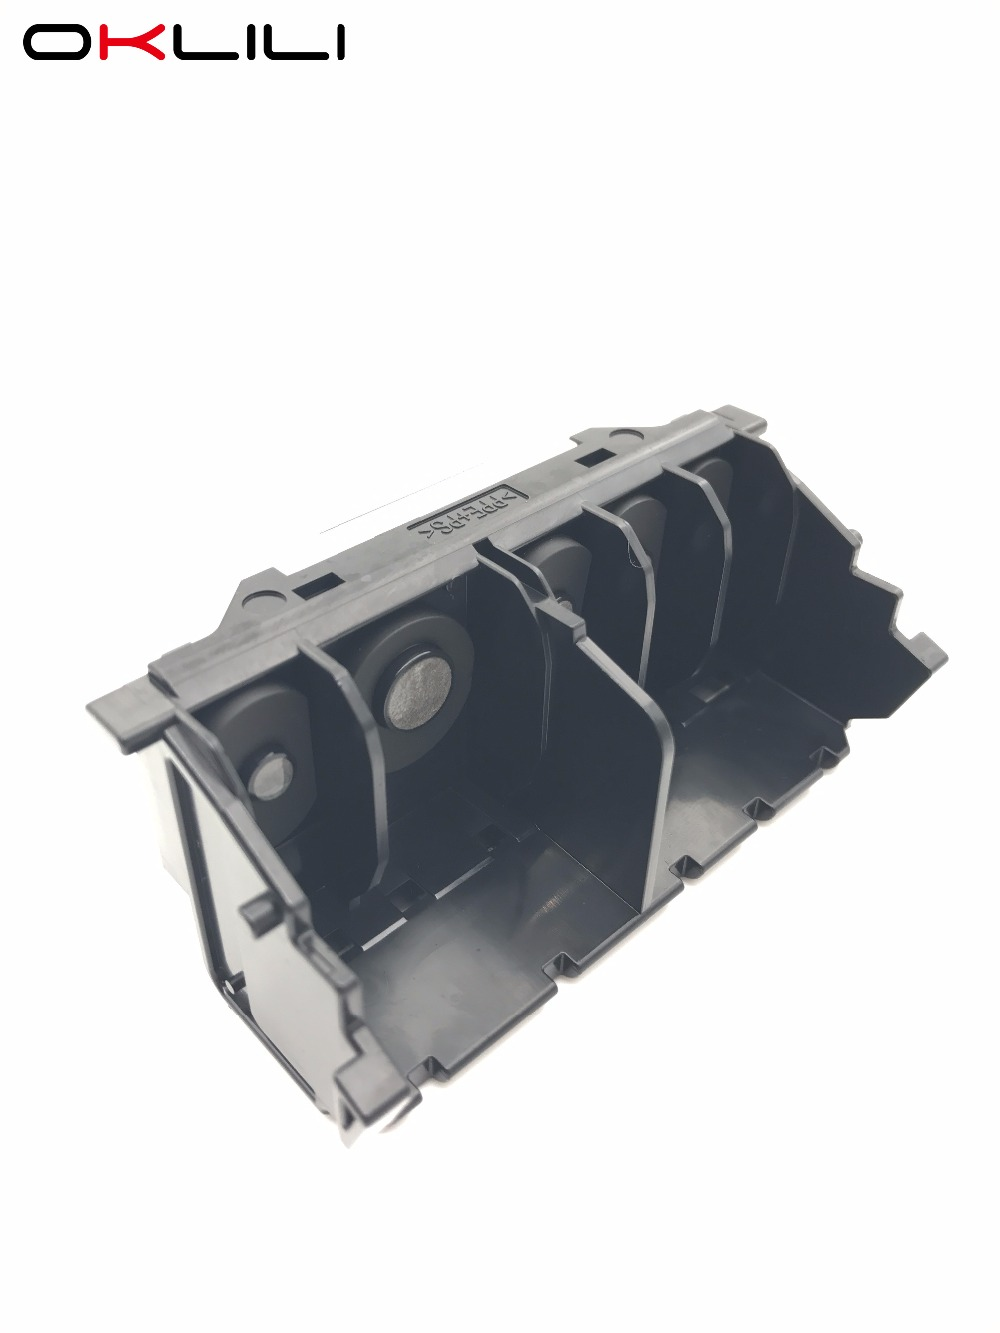 lowest price BIGTREETECH BTT SKR V1 4 SKR V1 4 Turbo 32 Bit Control Board TFT35 E3 V3 0 Touch Screen TMC2209 2208UART Driver Upgrade SKR V1 3